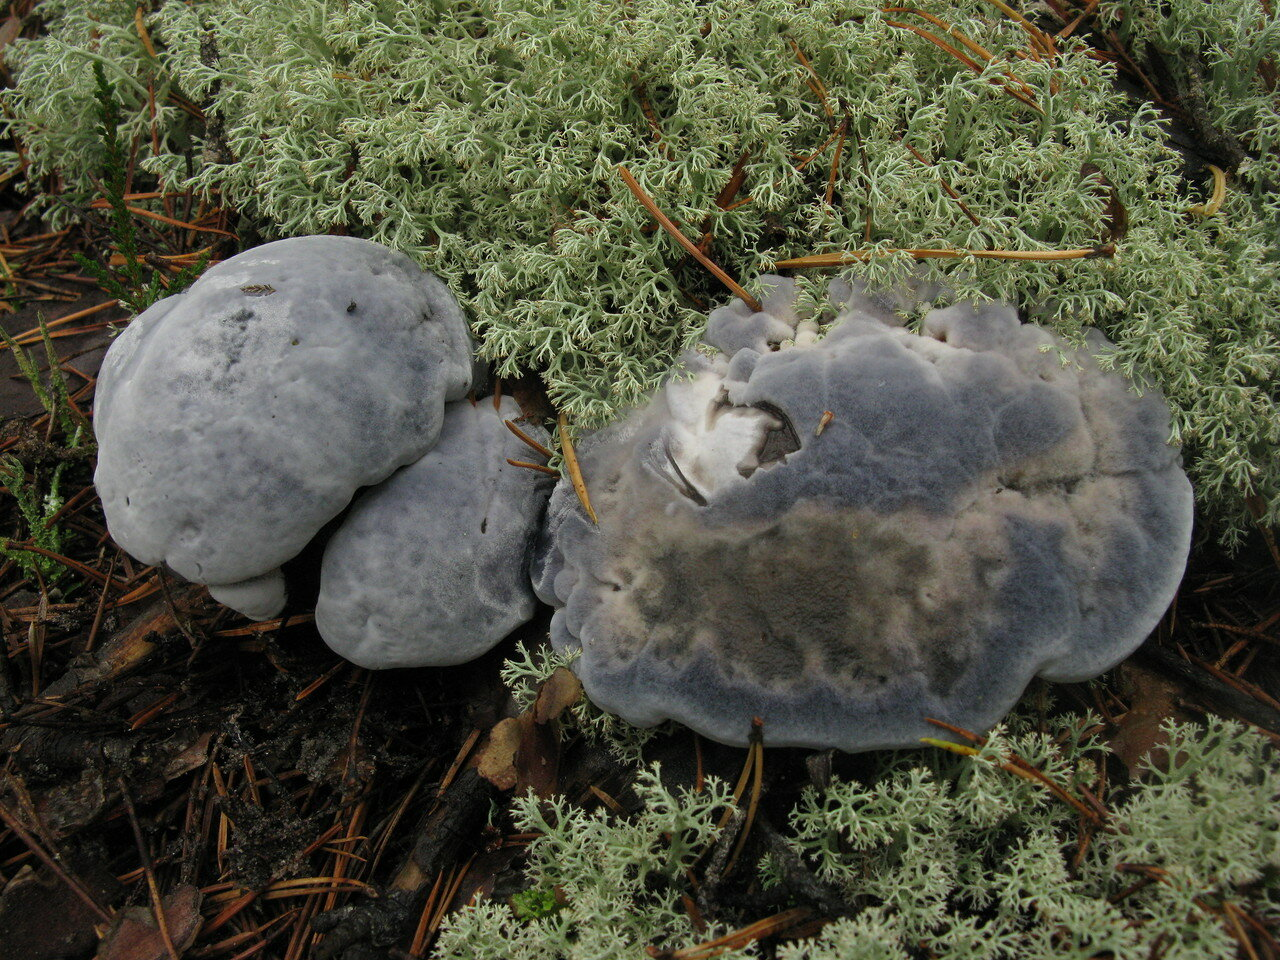 Гиднеллум <span class=wiki>голубой</span> (Hydnellum caeruleum). Автор фото:Станислав Кривошеев